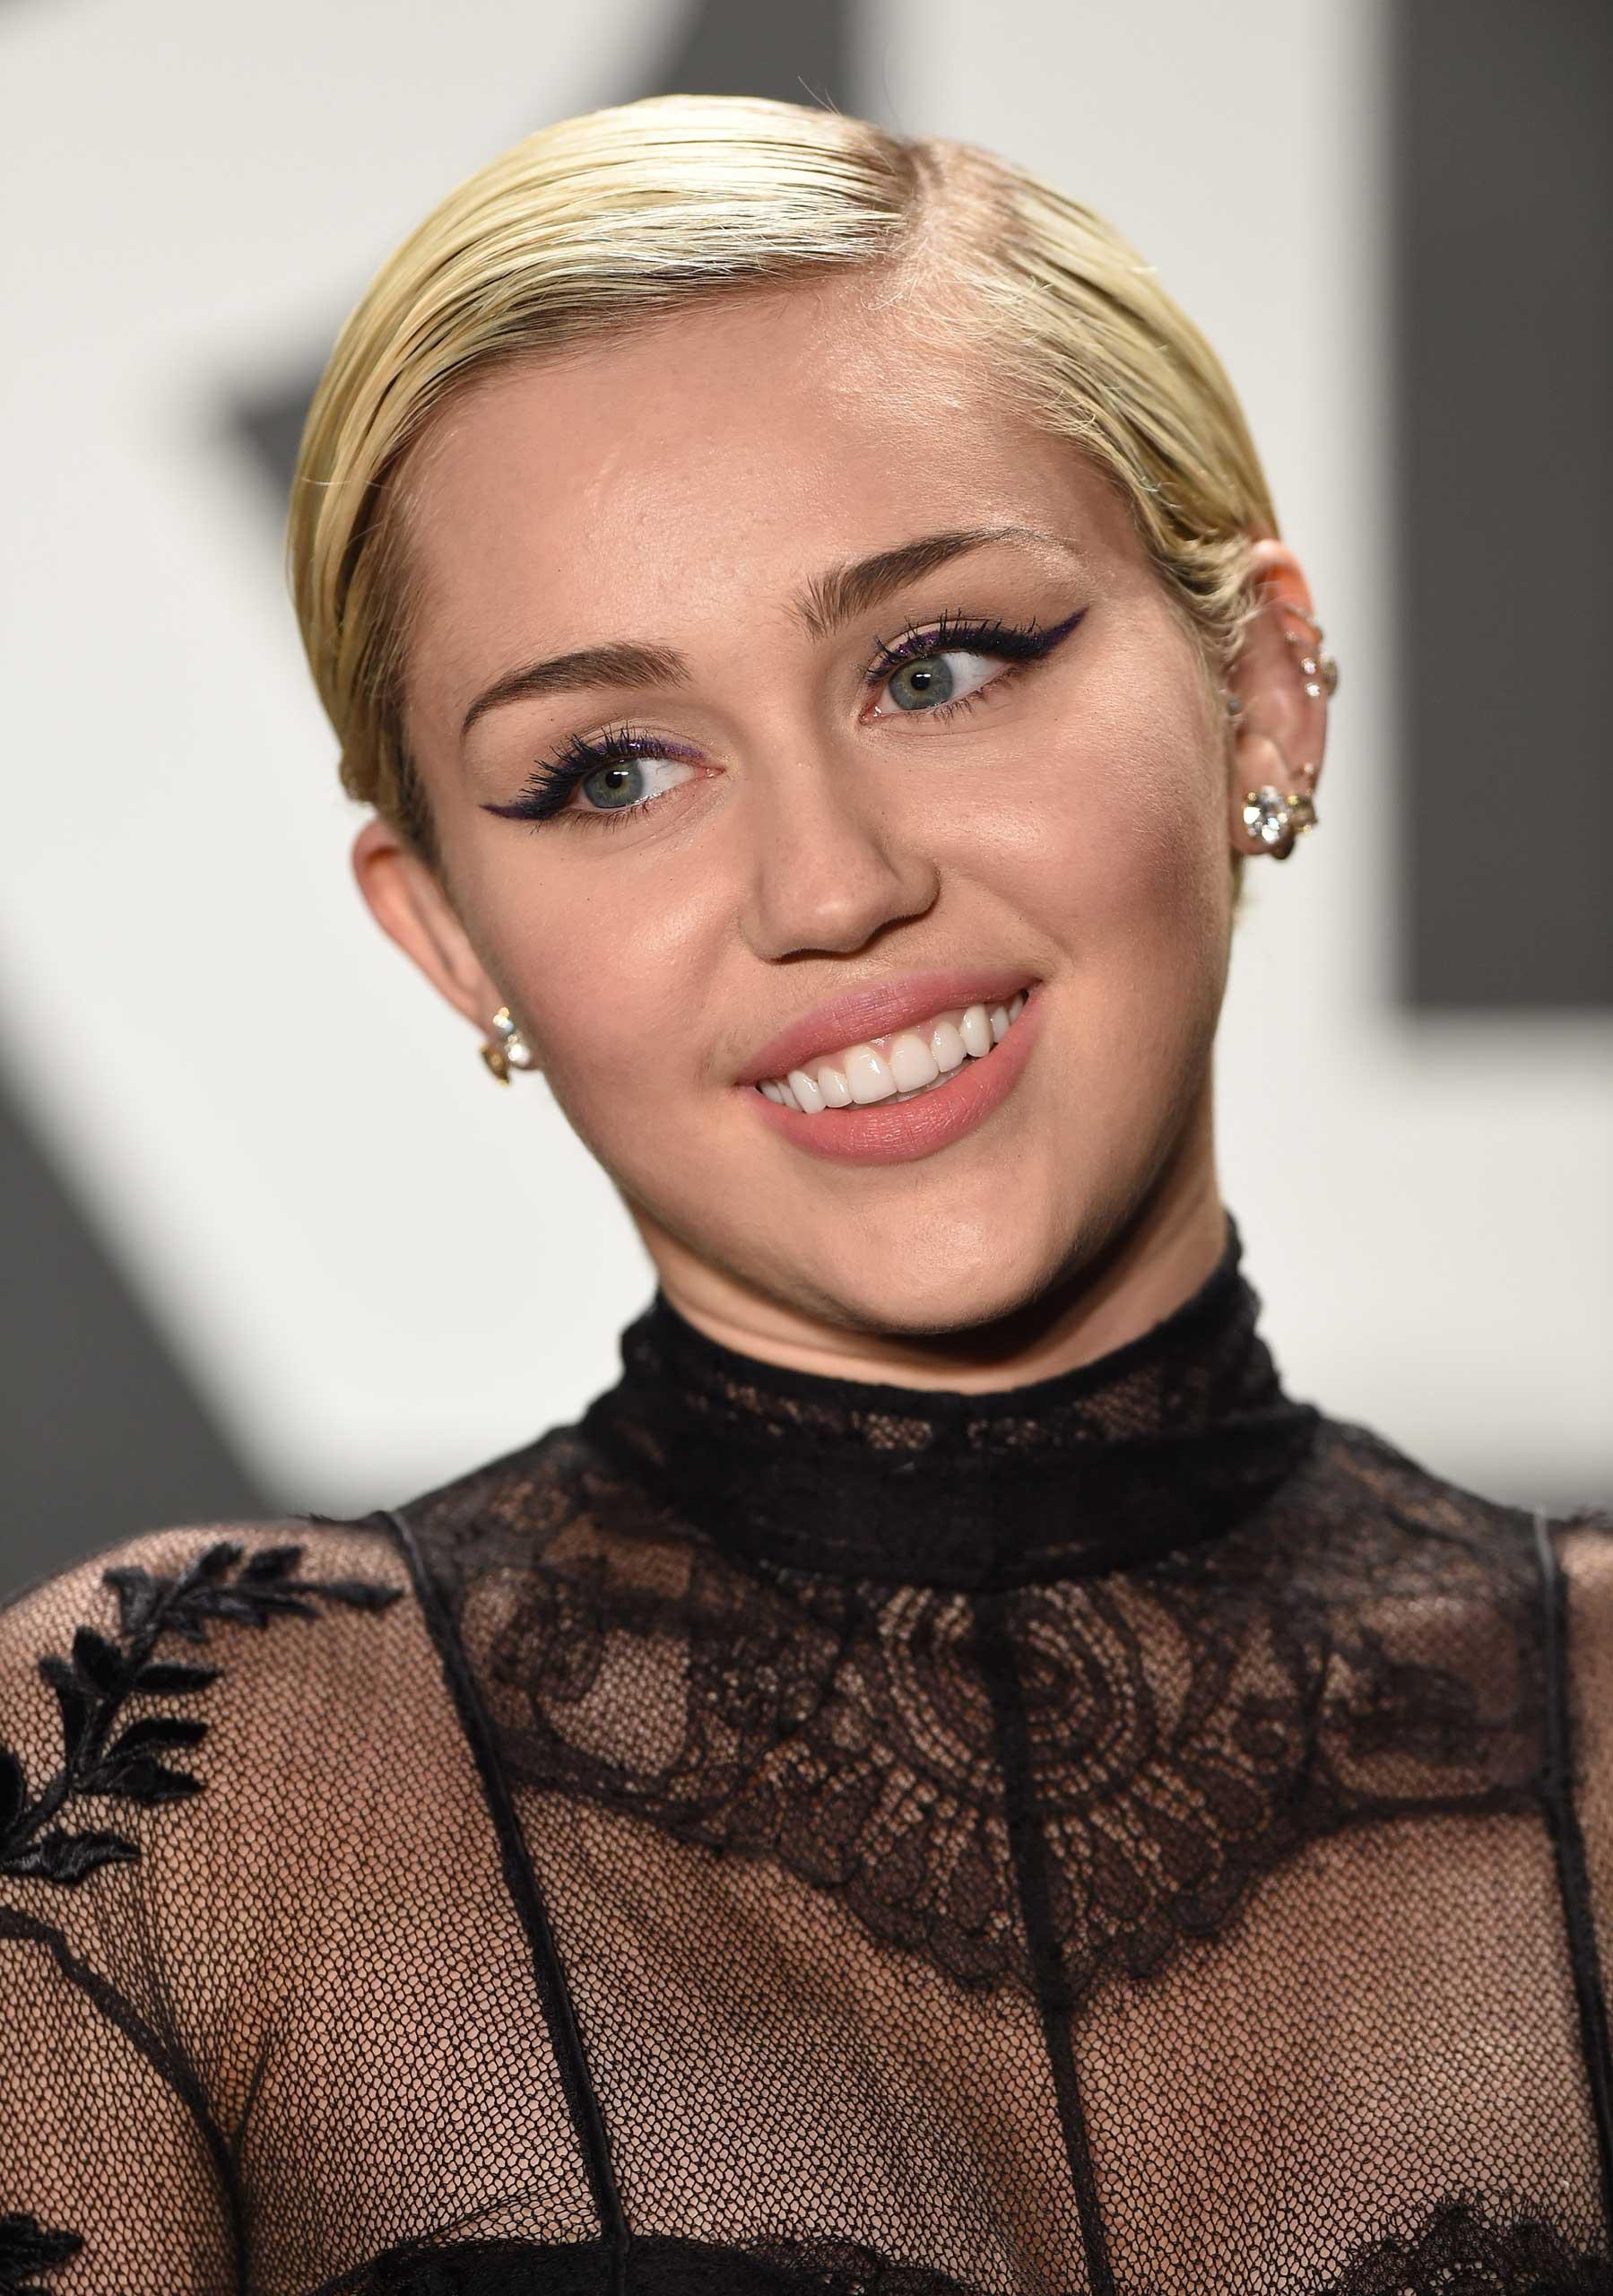 Predictions TIME 100 2015 Miley Cyrus